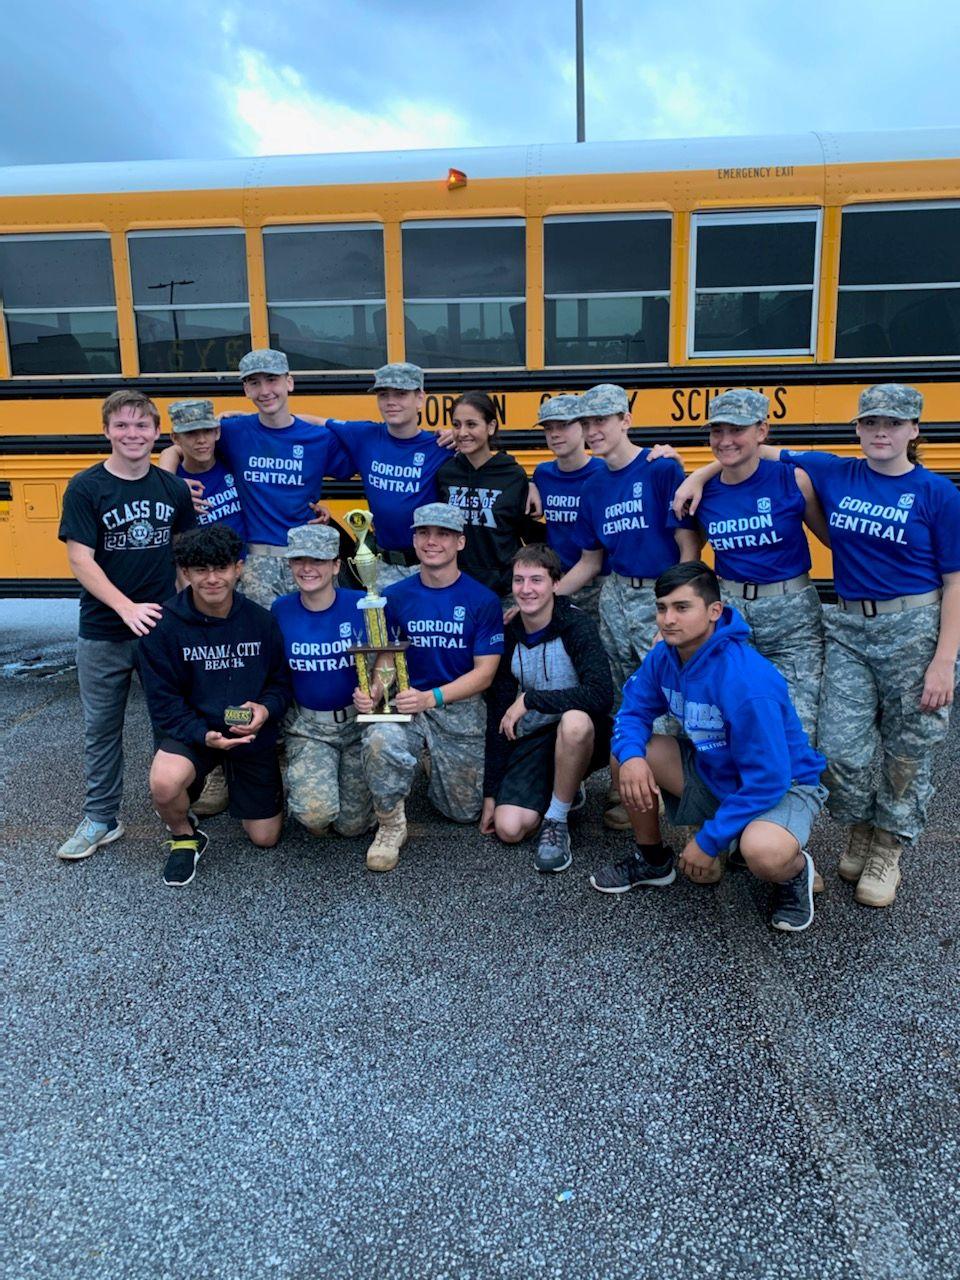 Gordon Central High School JROTC Raiders at State Meet 2019